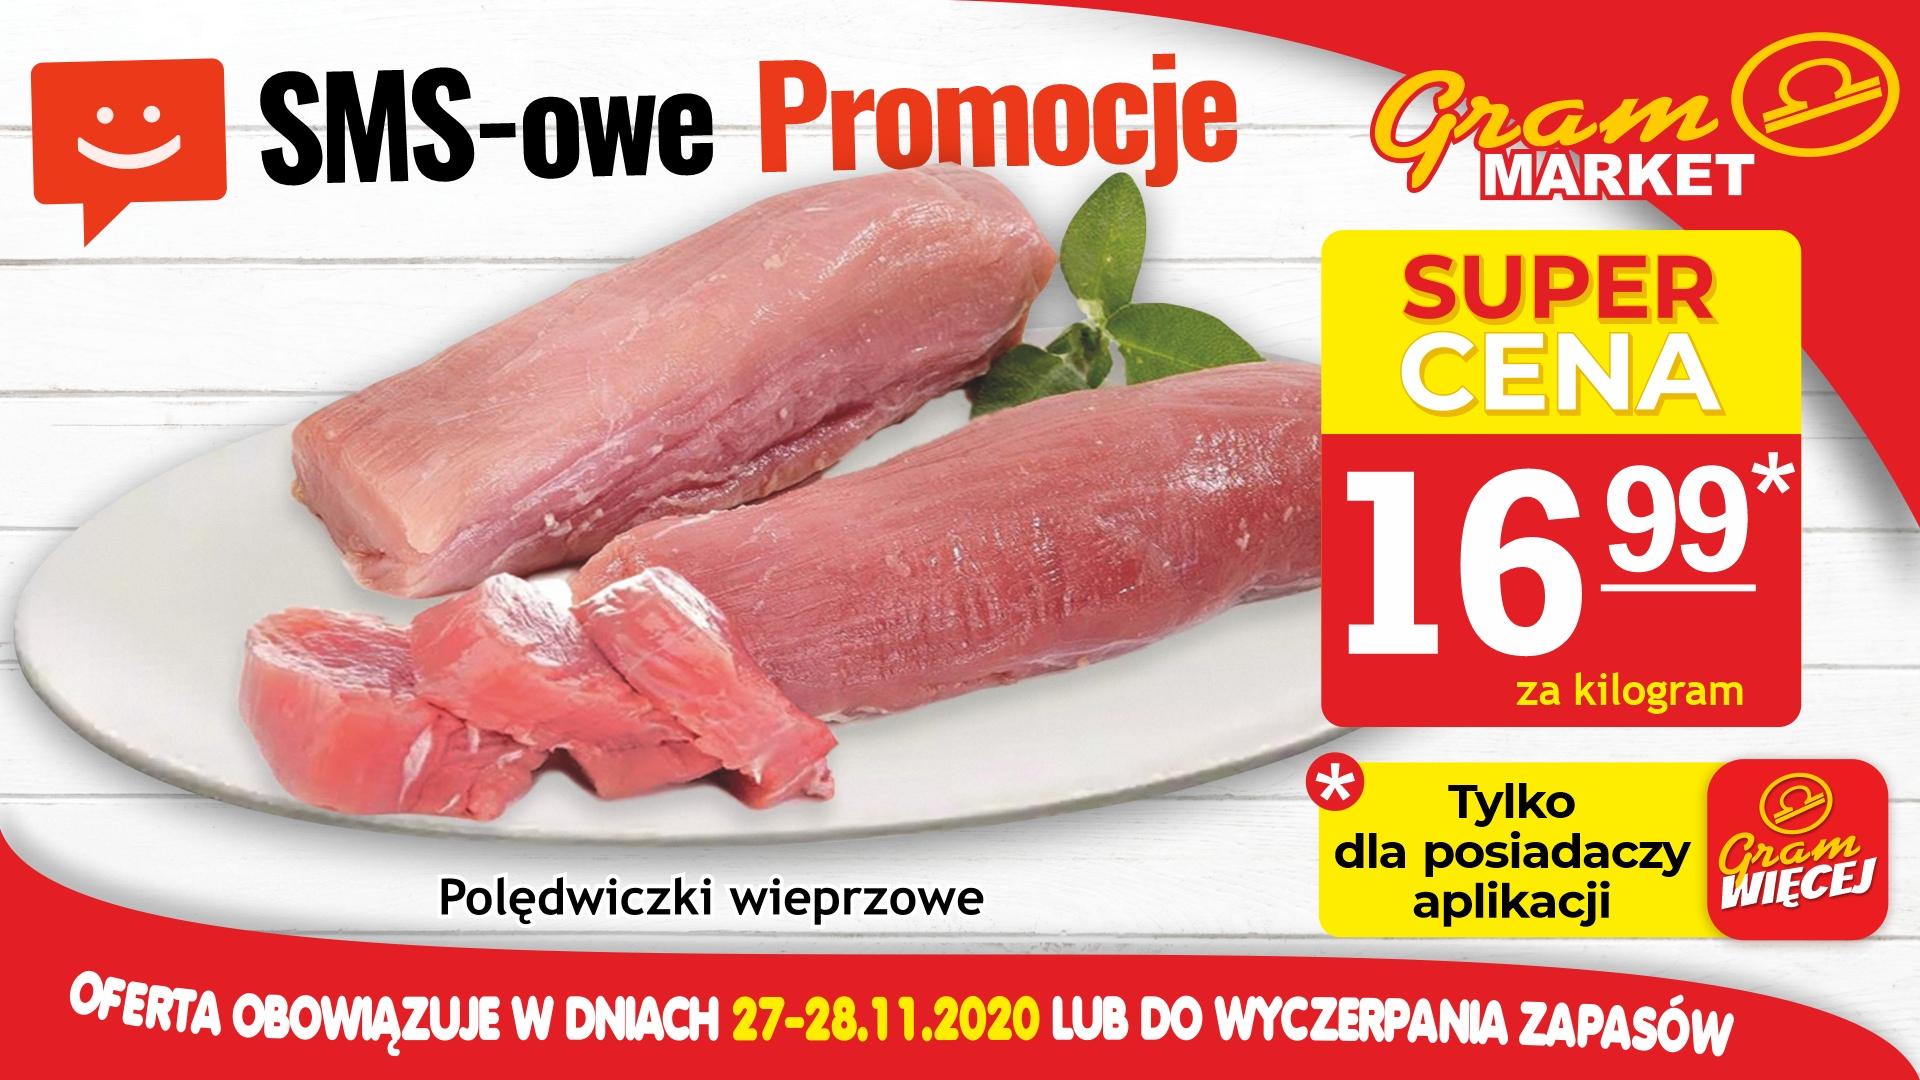 promo-SMS-27-28.11.2020